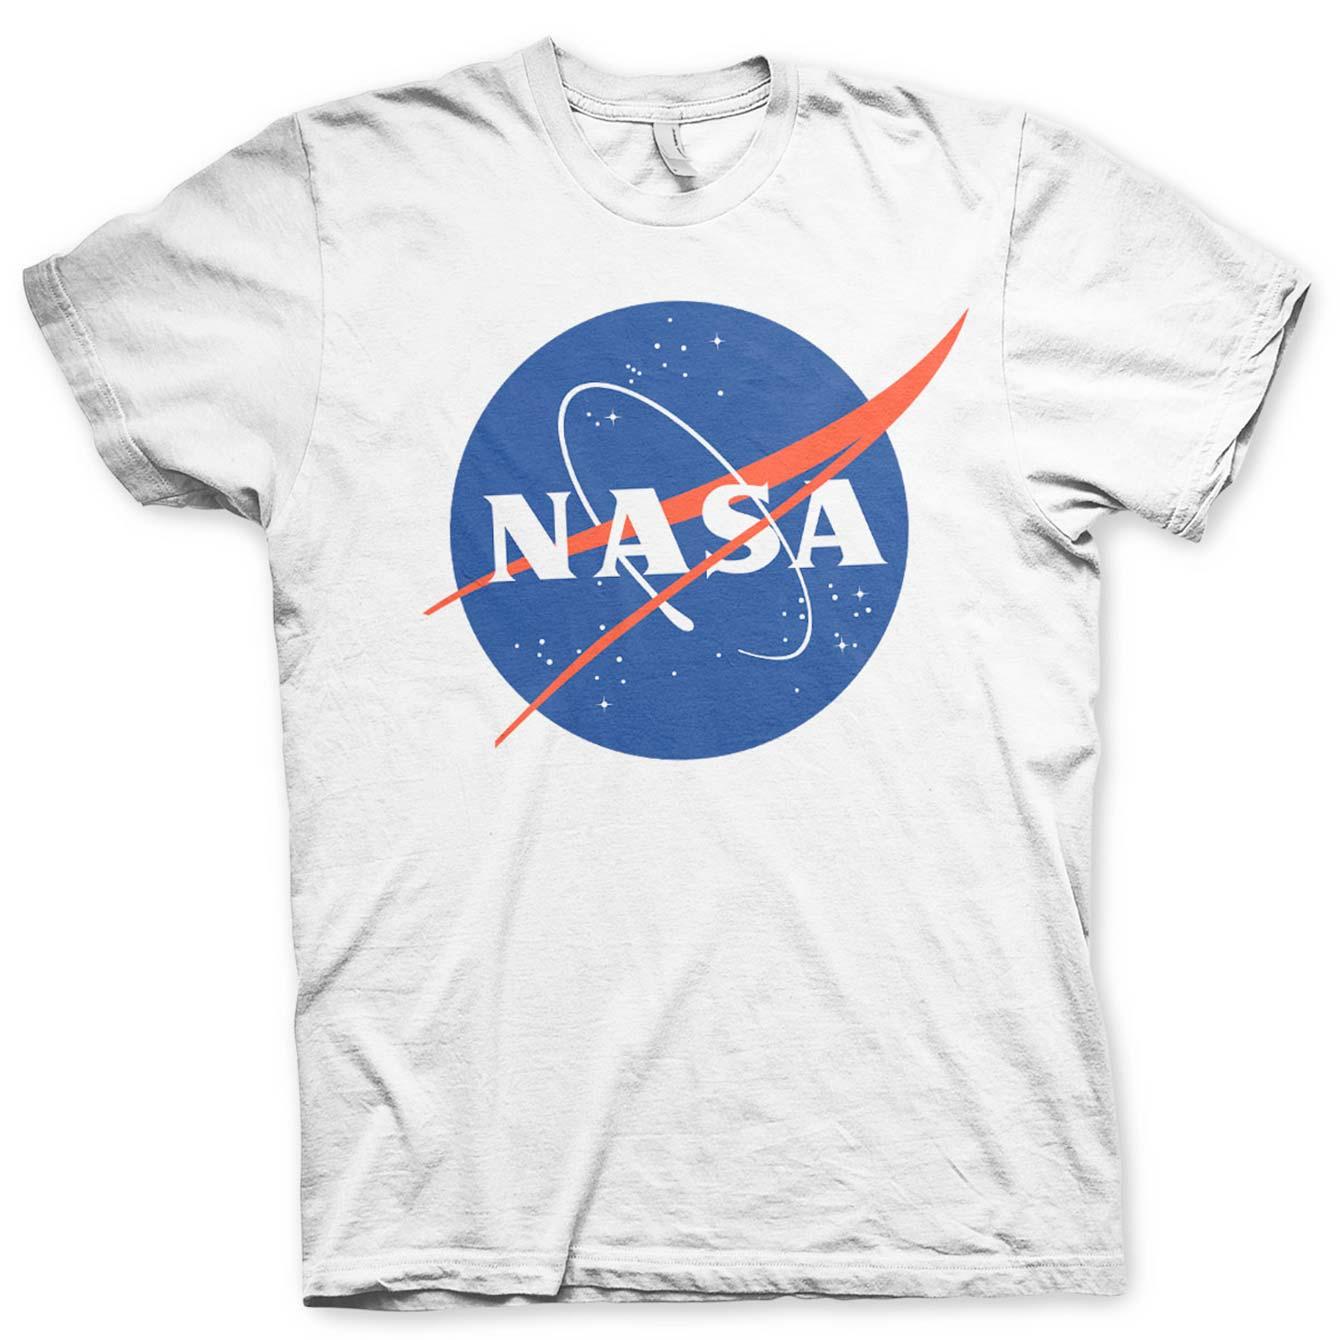 nasa-logo-hvid-t-shirt